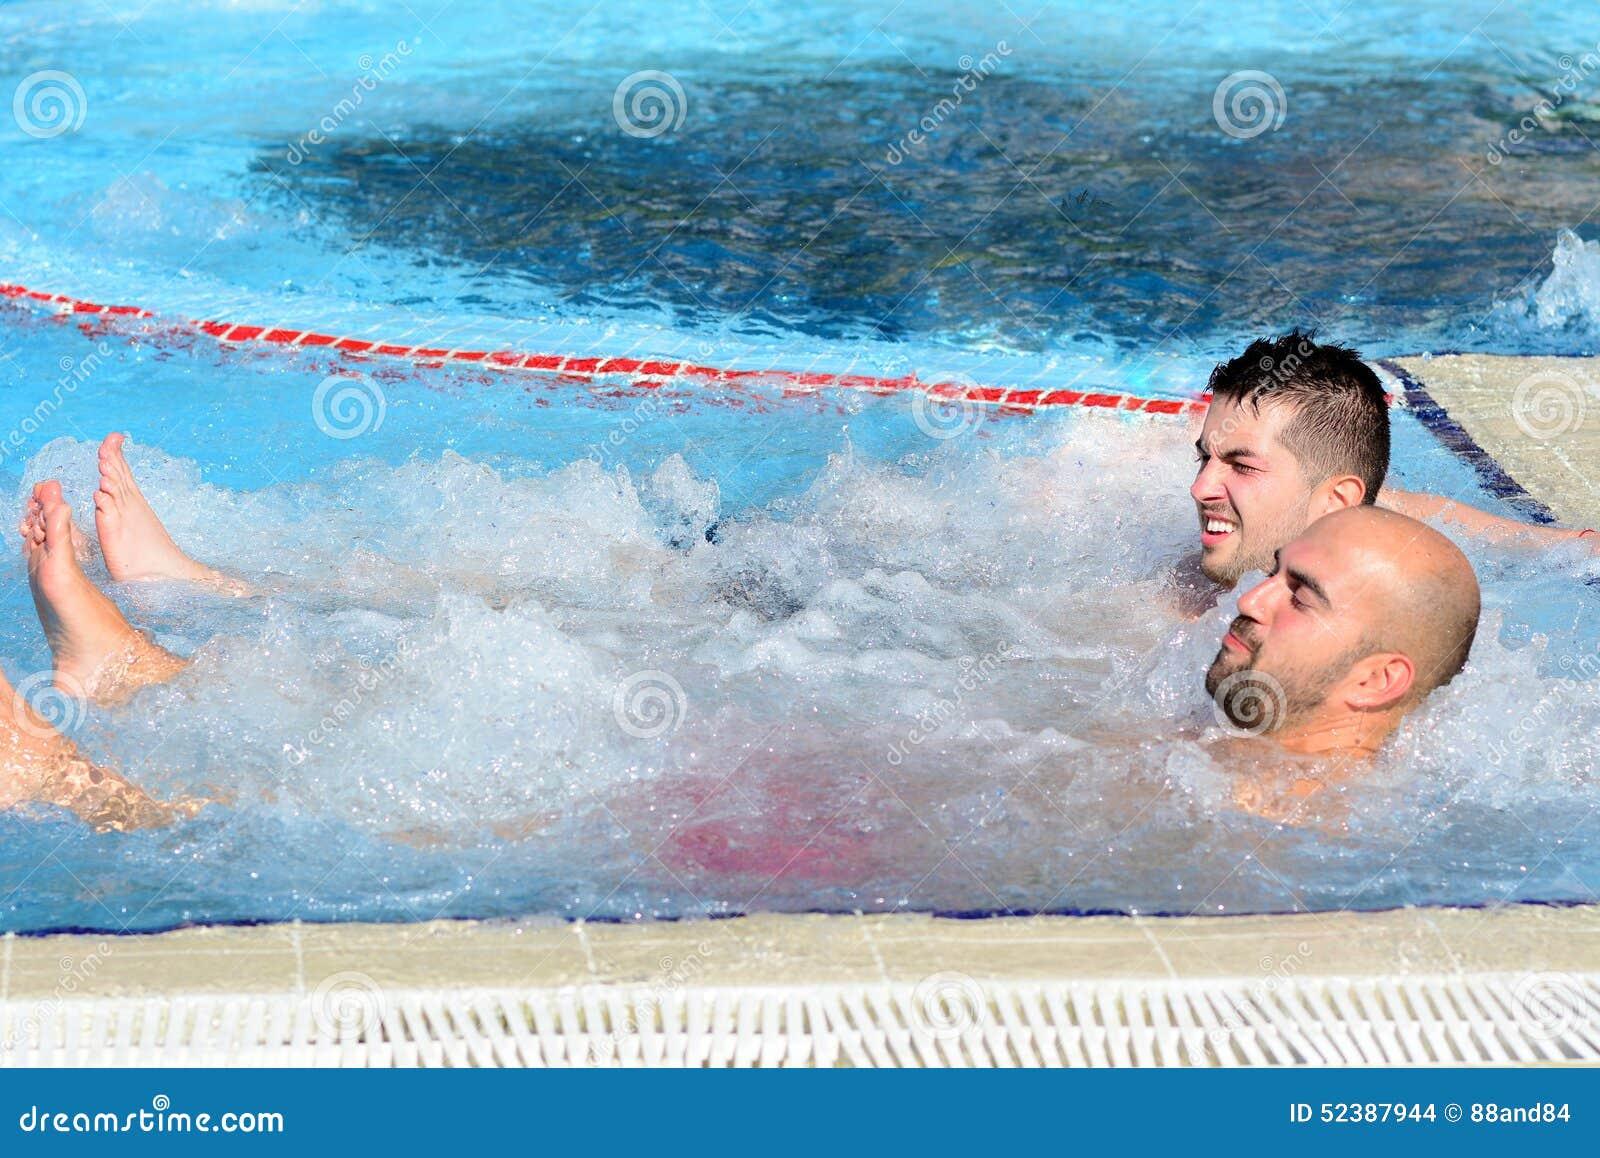 Two Men Enjoying Jacuzzi Hot Tub Bubble Bath Outdoor Stock Photo ...